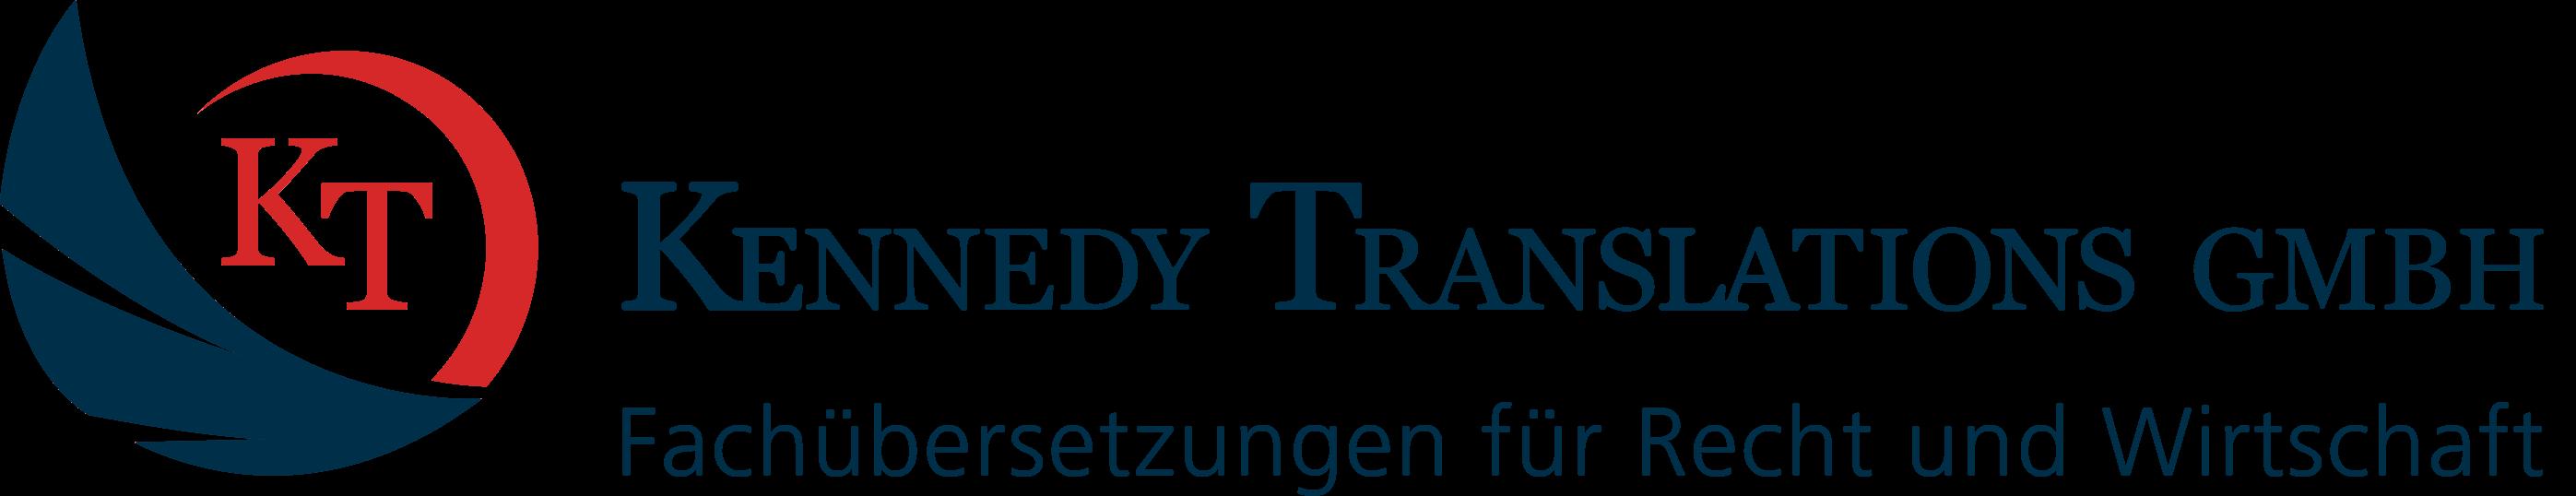 Übersetzungsbüro Kennedy Translations GmbH Logo